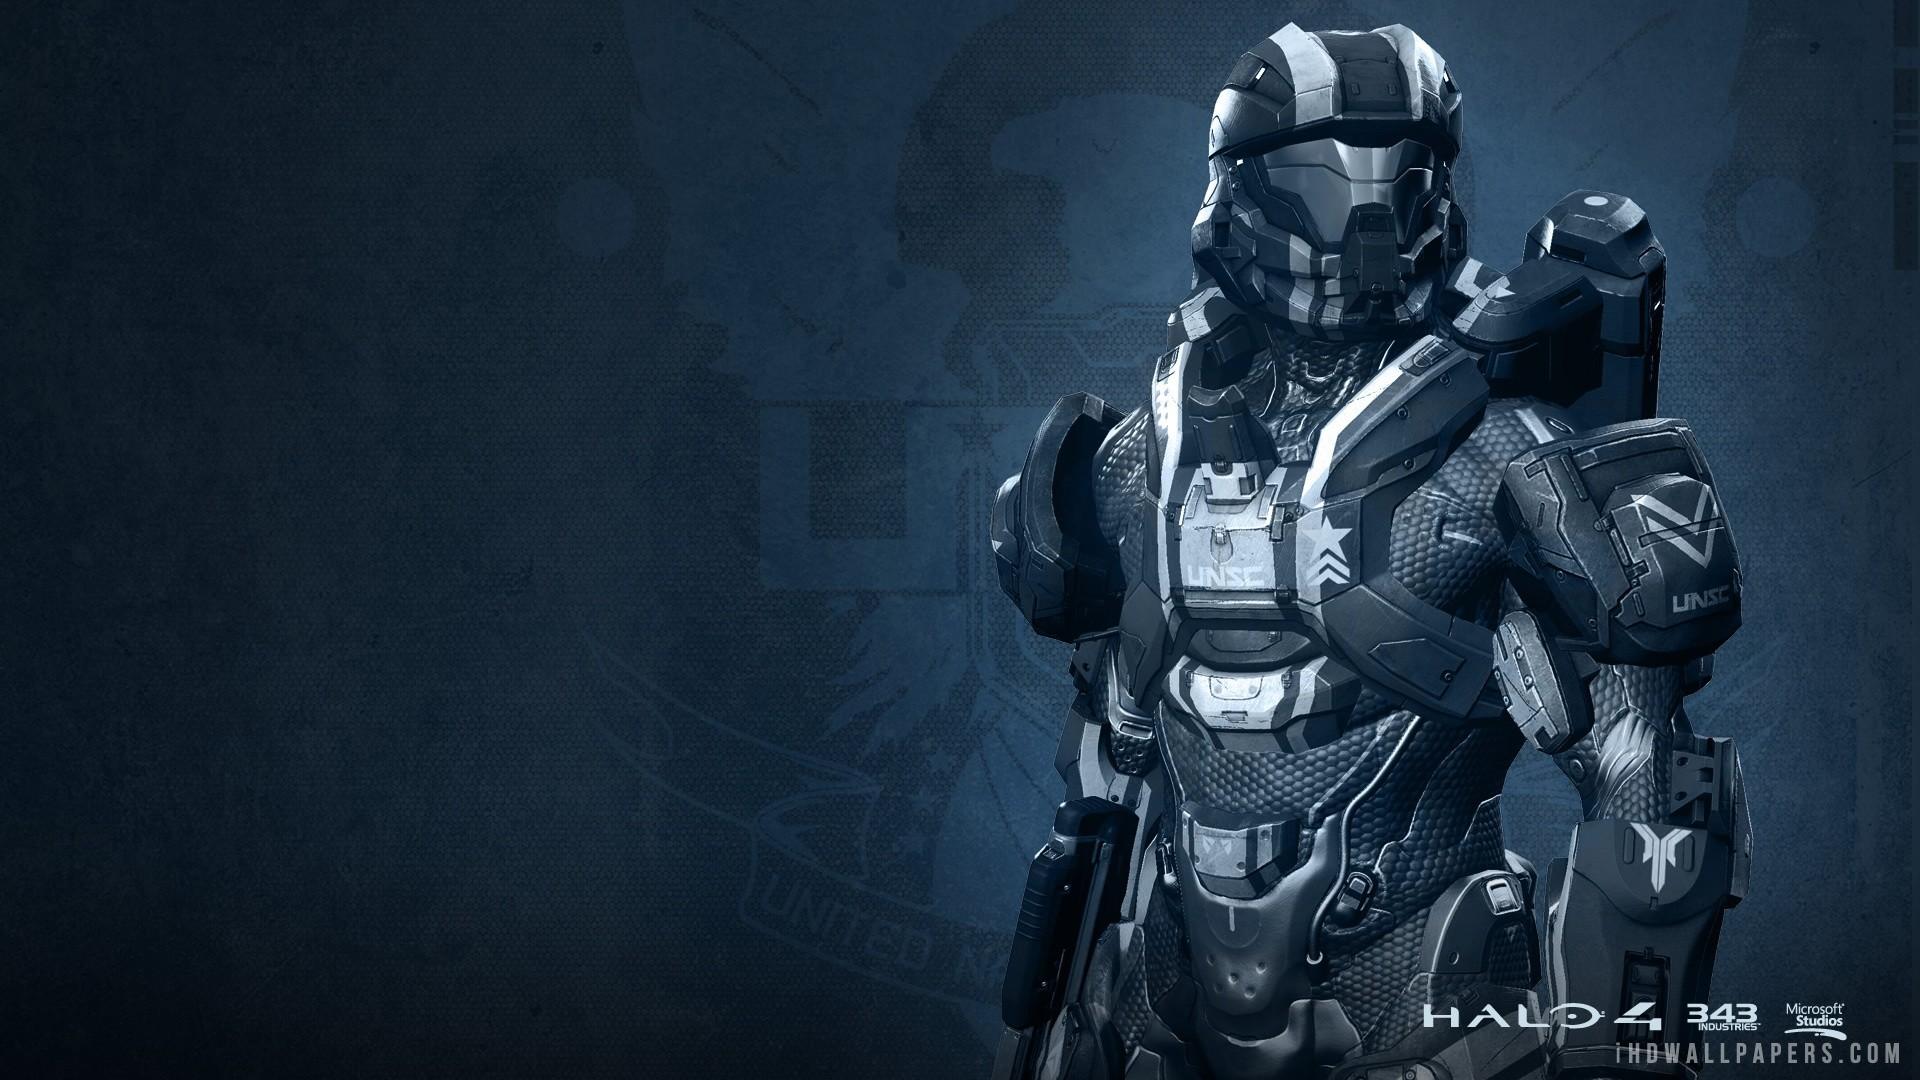 Halo 5 High Definition